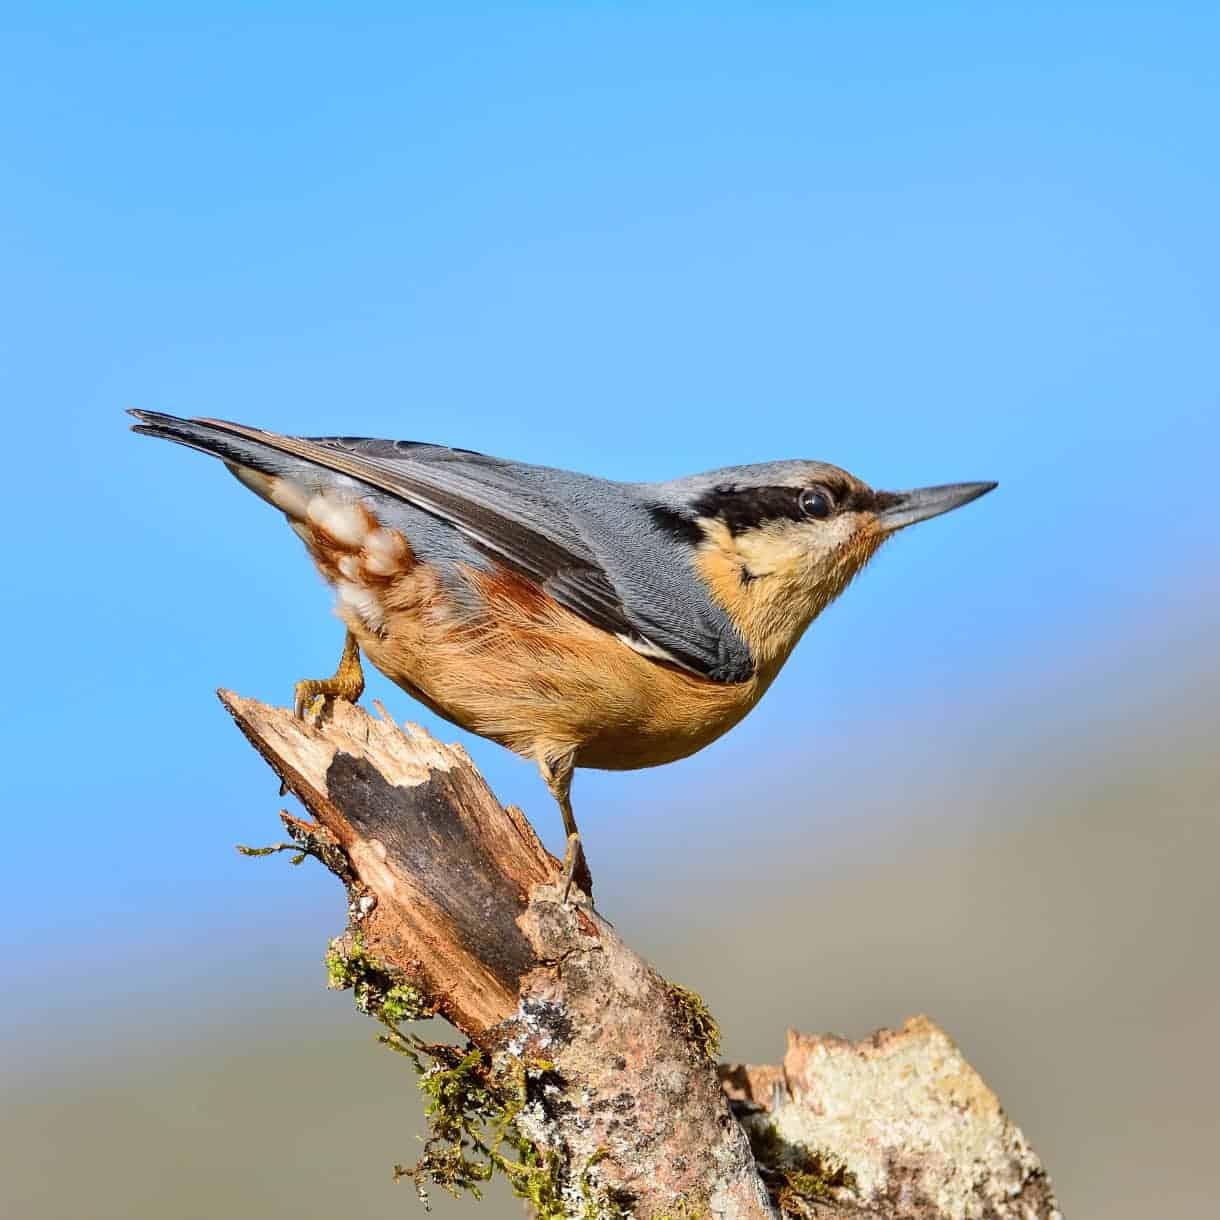 All About The Nuthatch Gardenbird